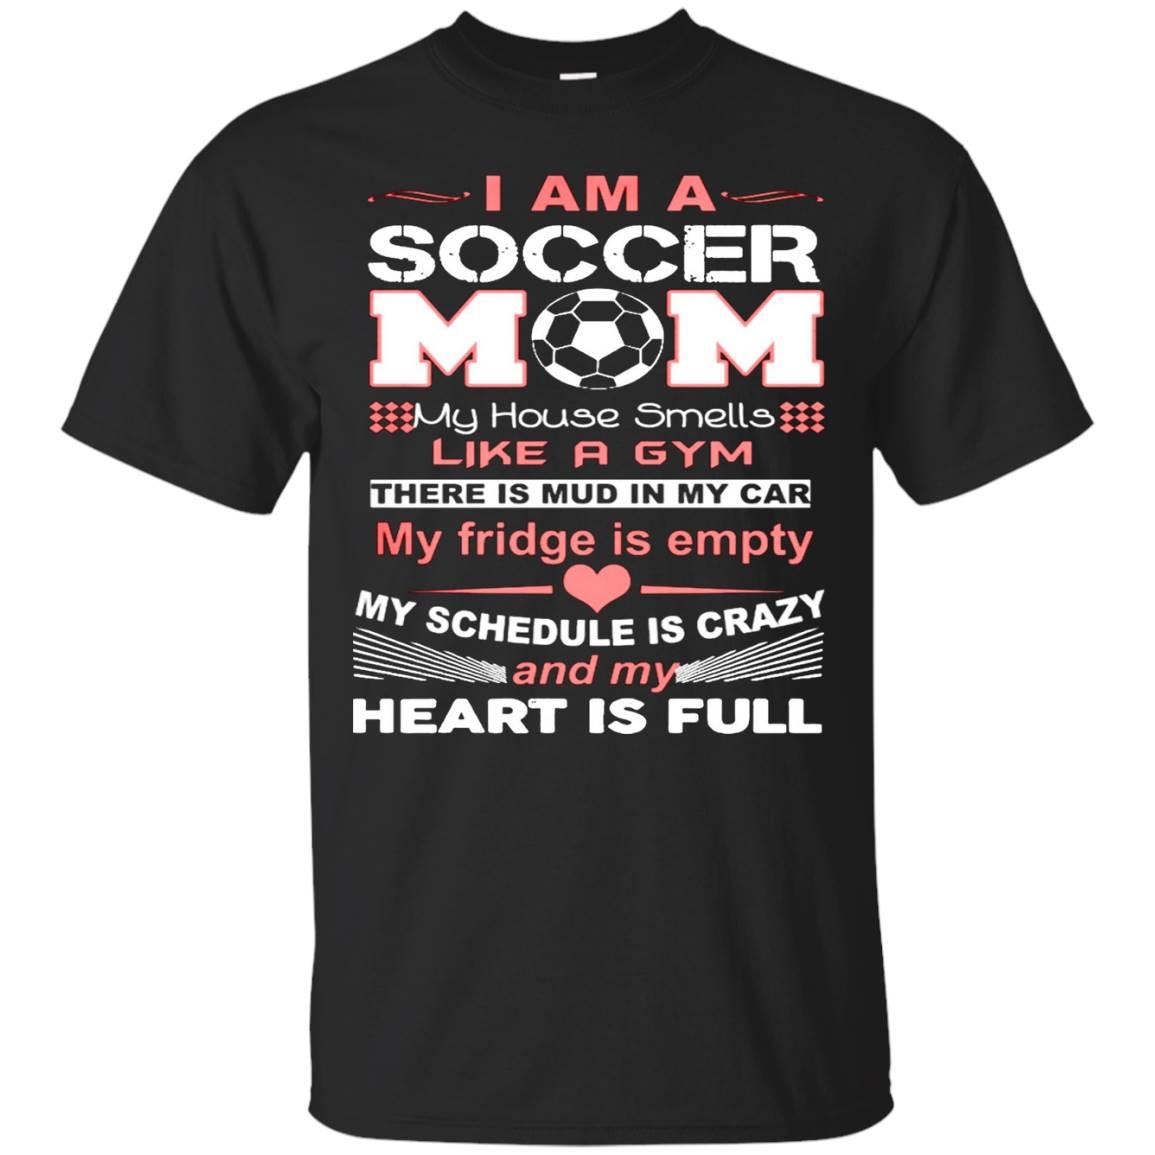 I'm a soccer mom t shirt